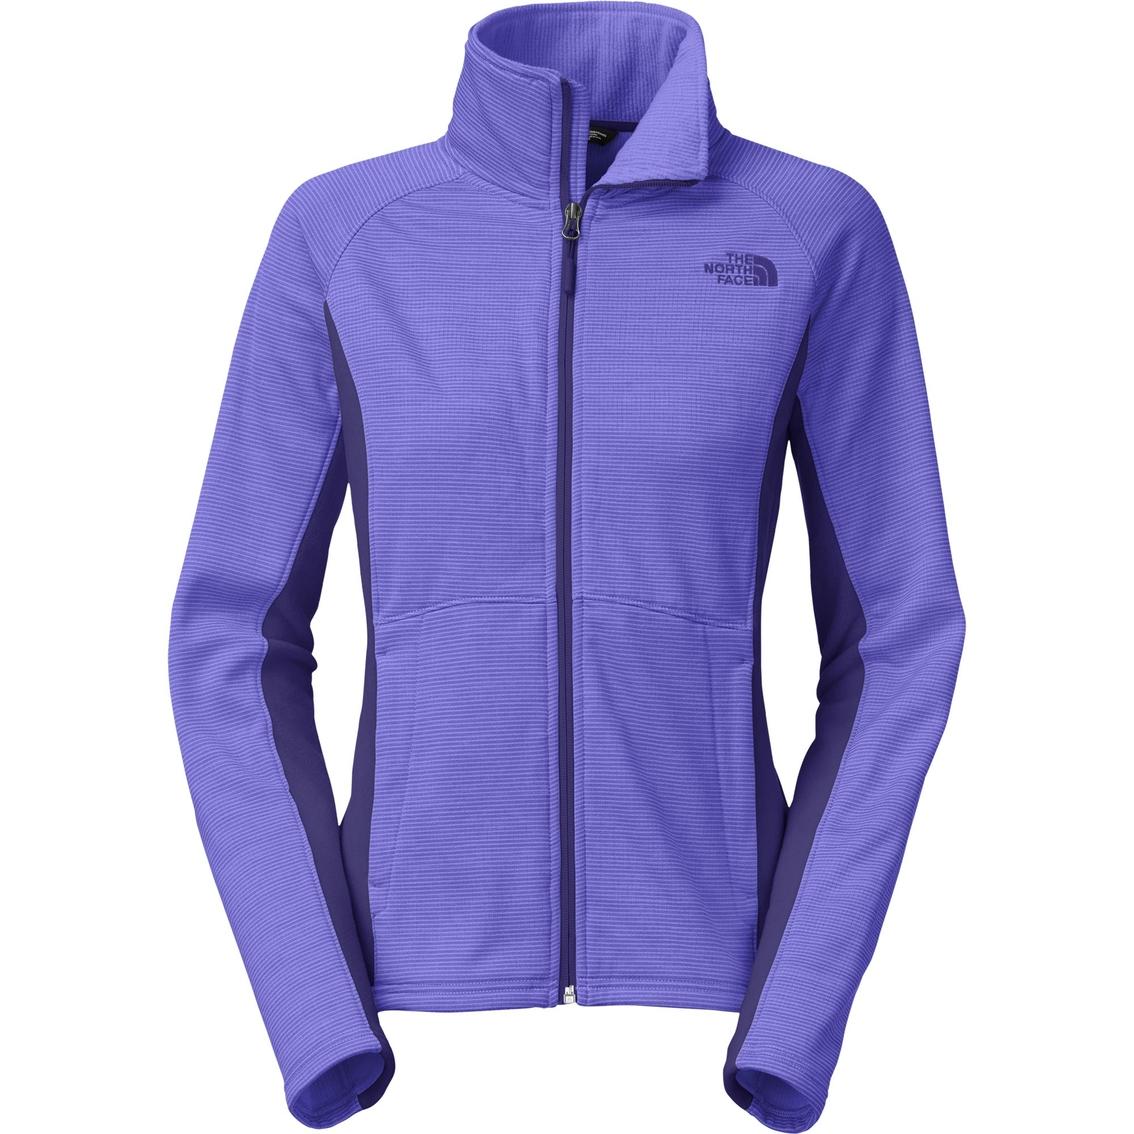 The North Face Castle Crag Full Zip Fleece Jacket Jackets